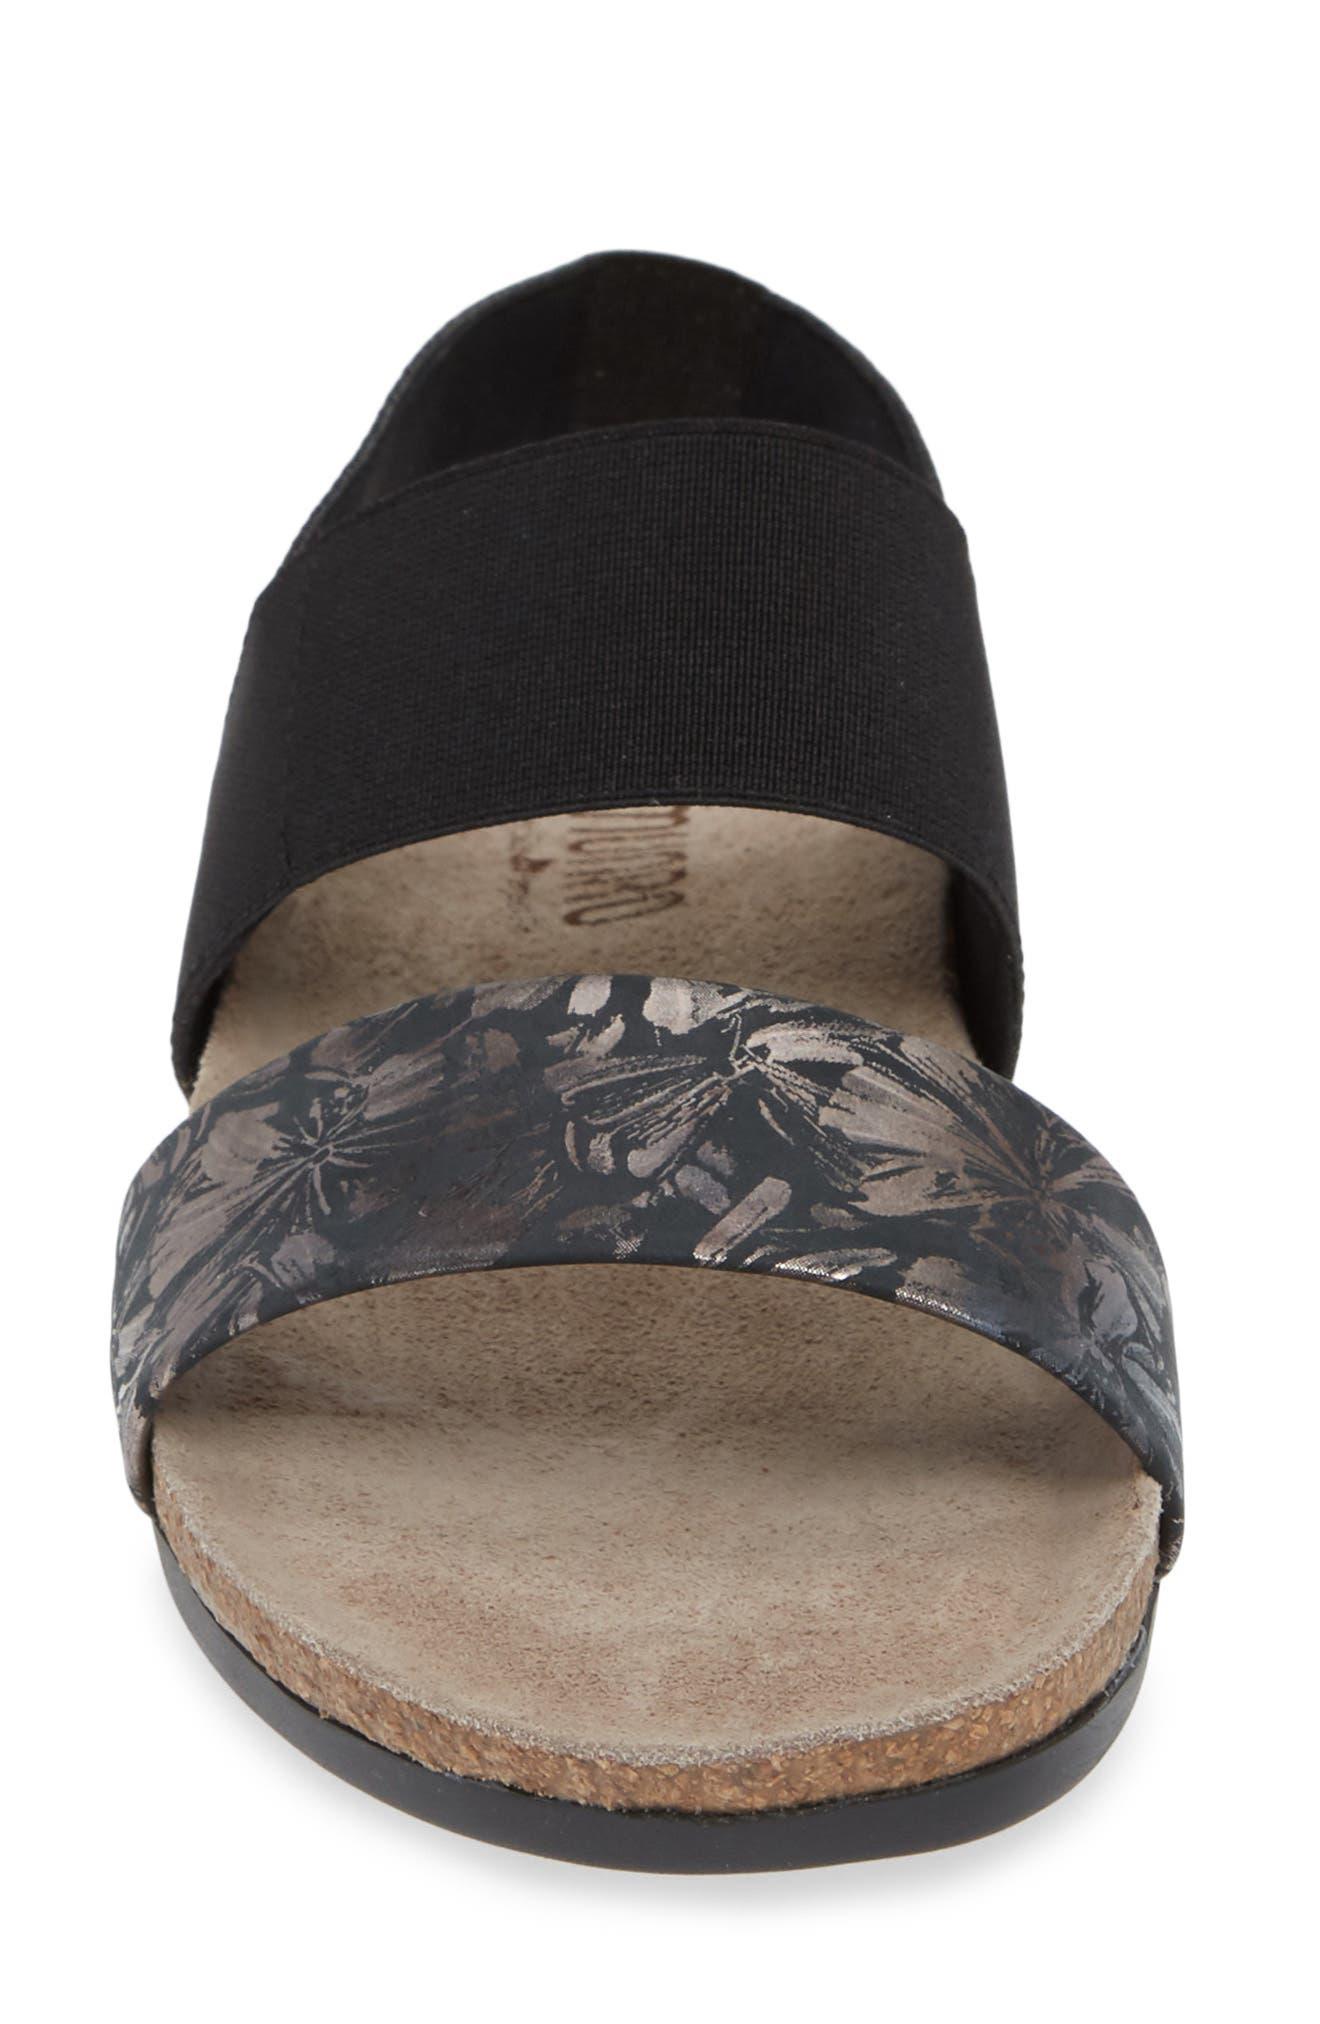 'Pisces' Sandal,                             Alternate thumbnail 4, color,                             DARK FLORAL PRINT LEATHER